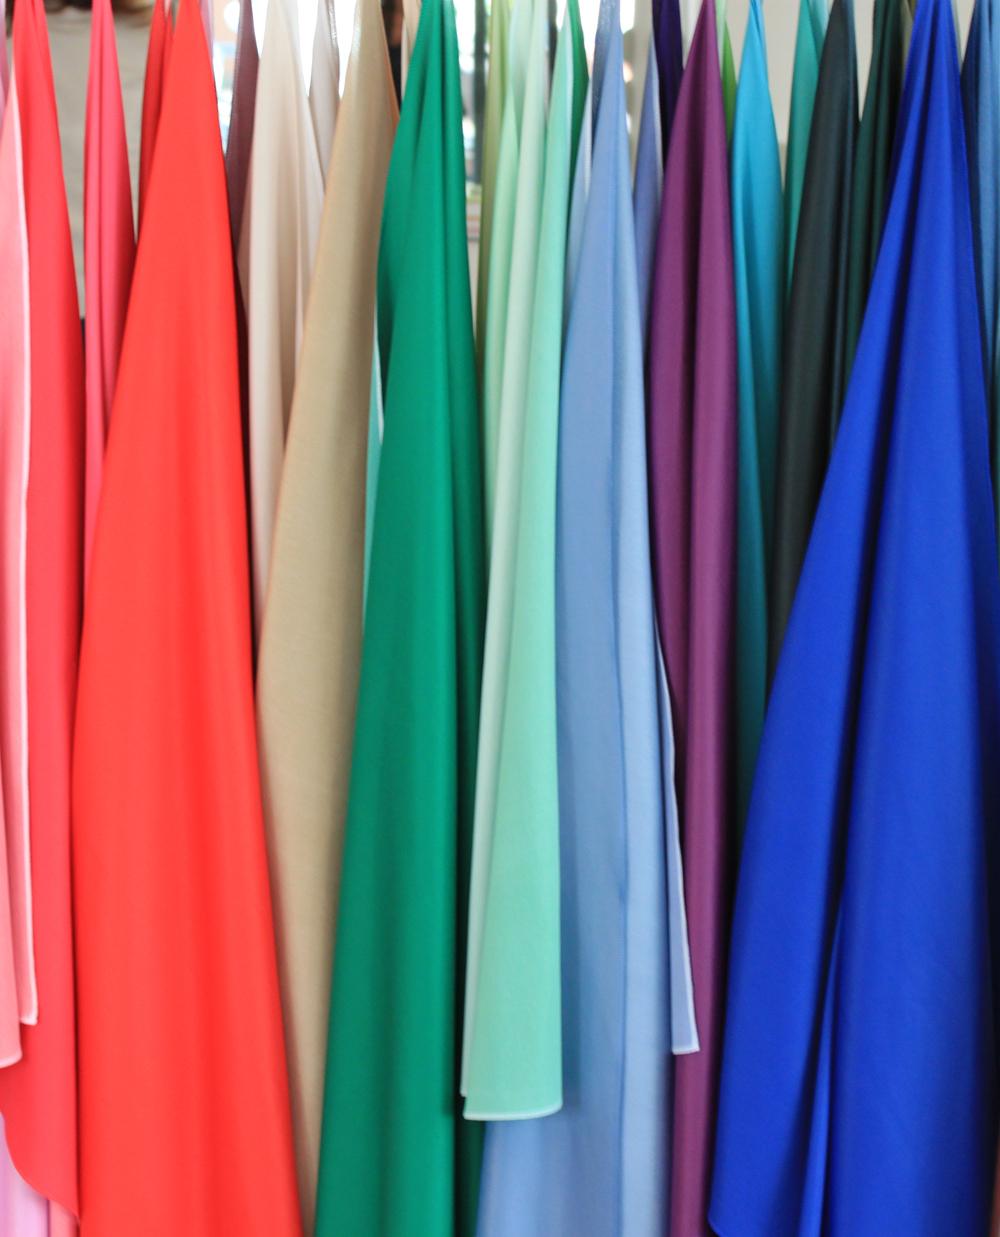 quemepongo-test-color-moda-personal-shopper-nexttrend.jpg